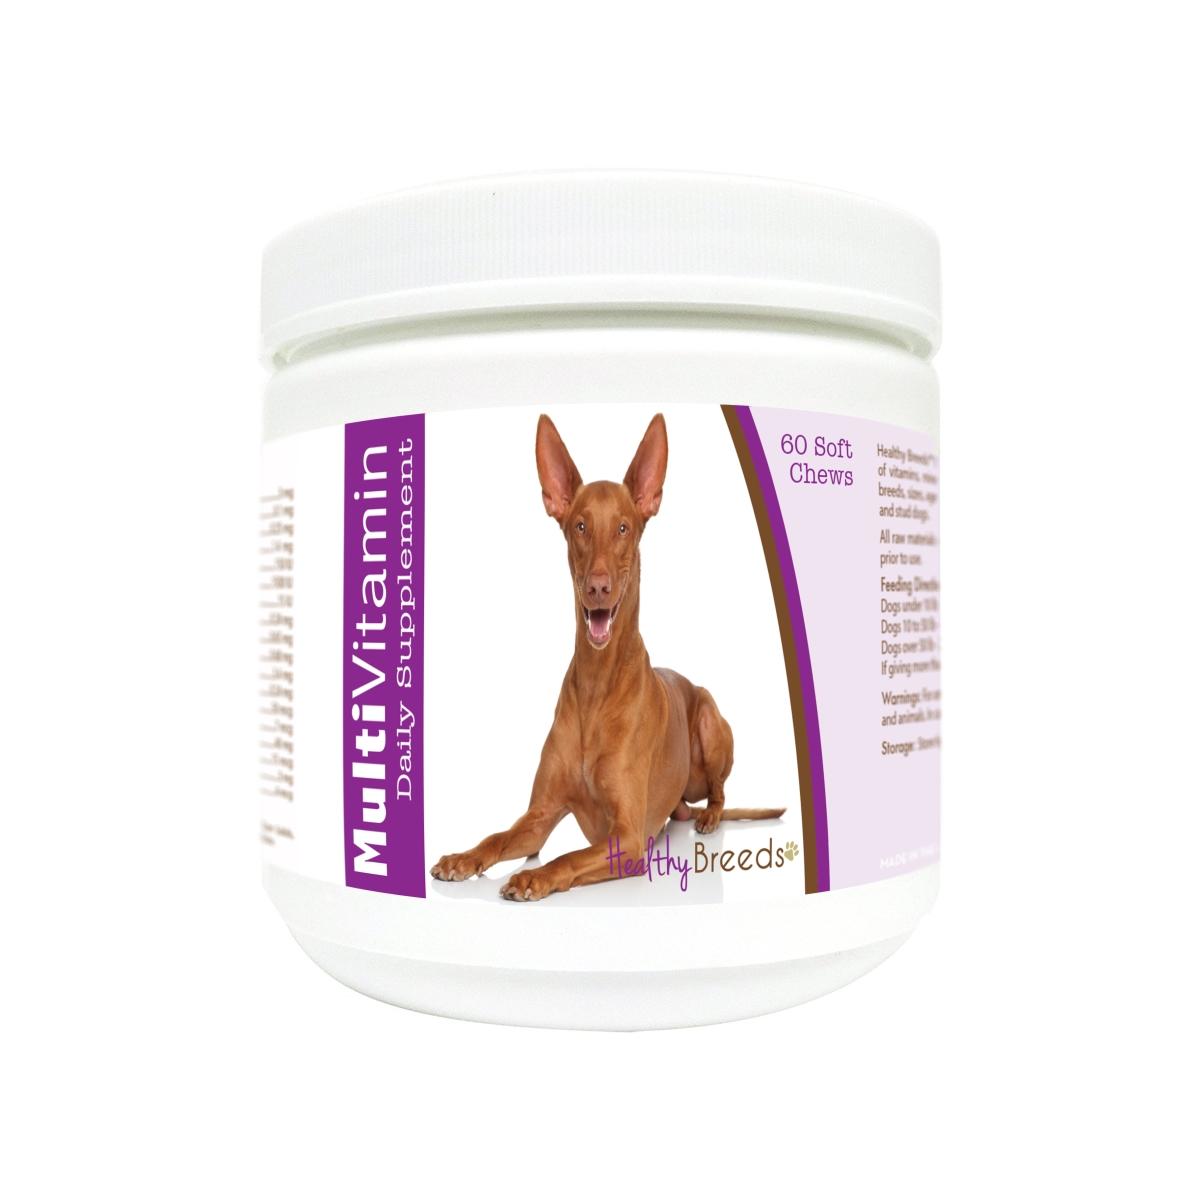 Healthy Breeds 840235181453 Pharaoh Hound Multi-Vitamin Soft Chews - 60 Count